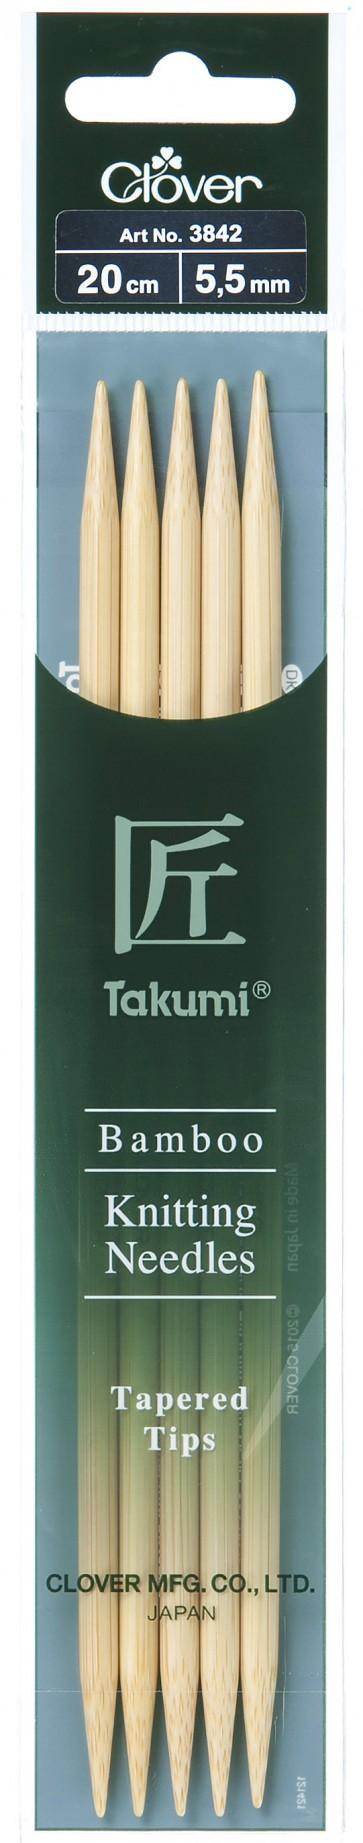 CLOVER Strumpfstrickndl Bambus Takumi 20cm/5.50mm